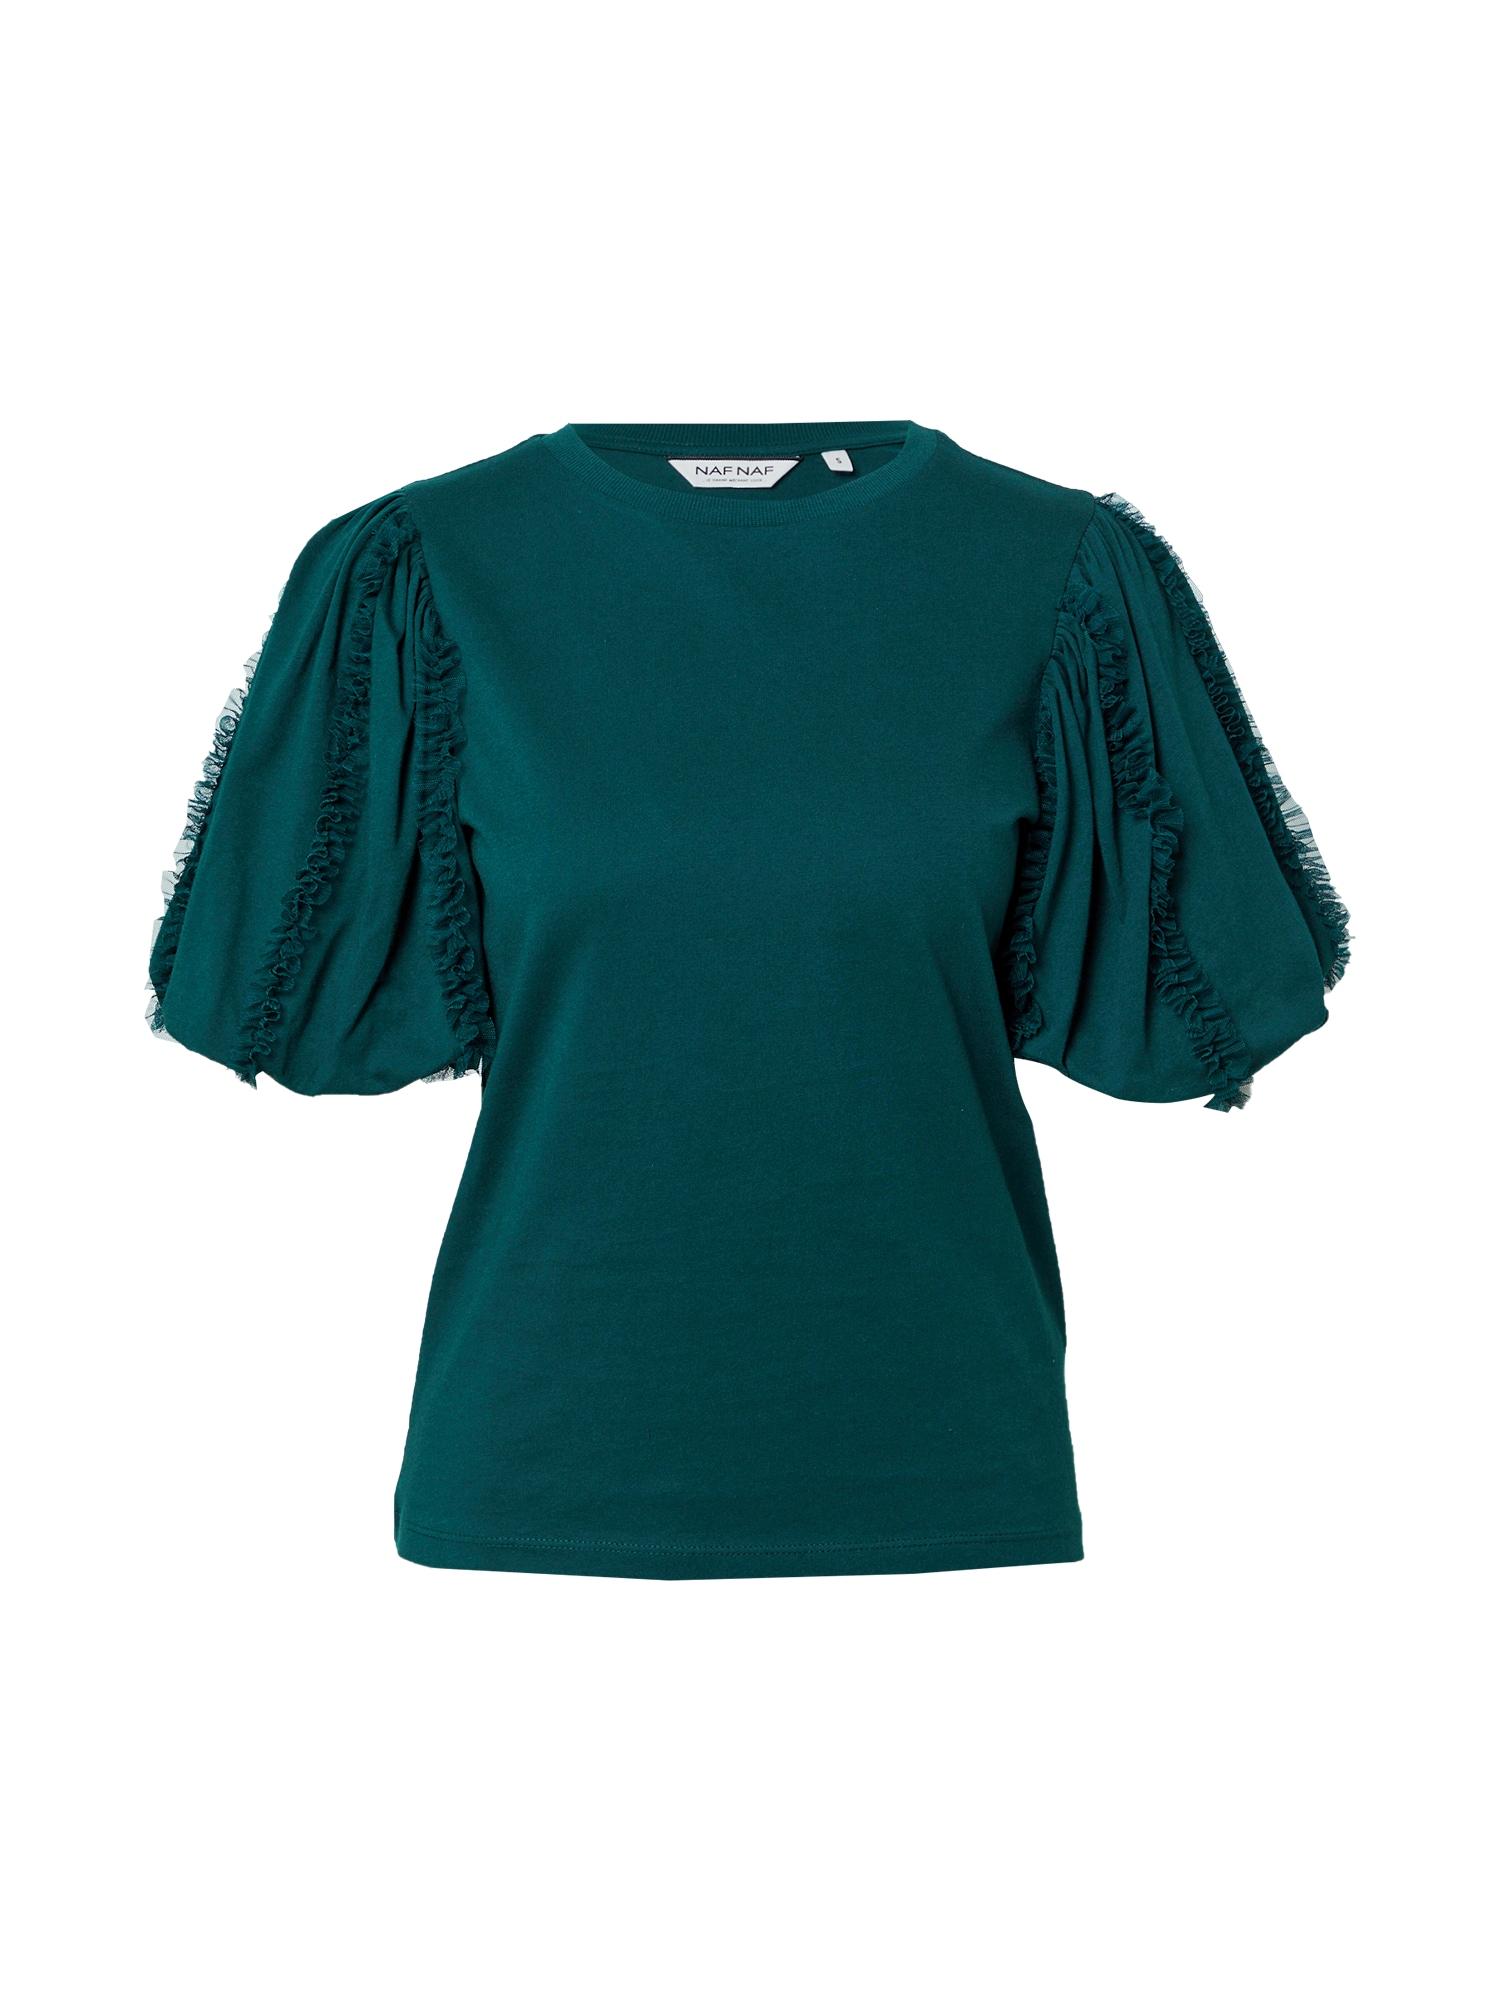 NAF NAF Marškinėliai smaragdinė spalva